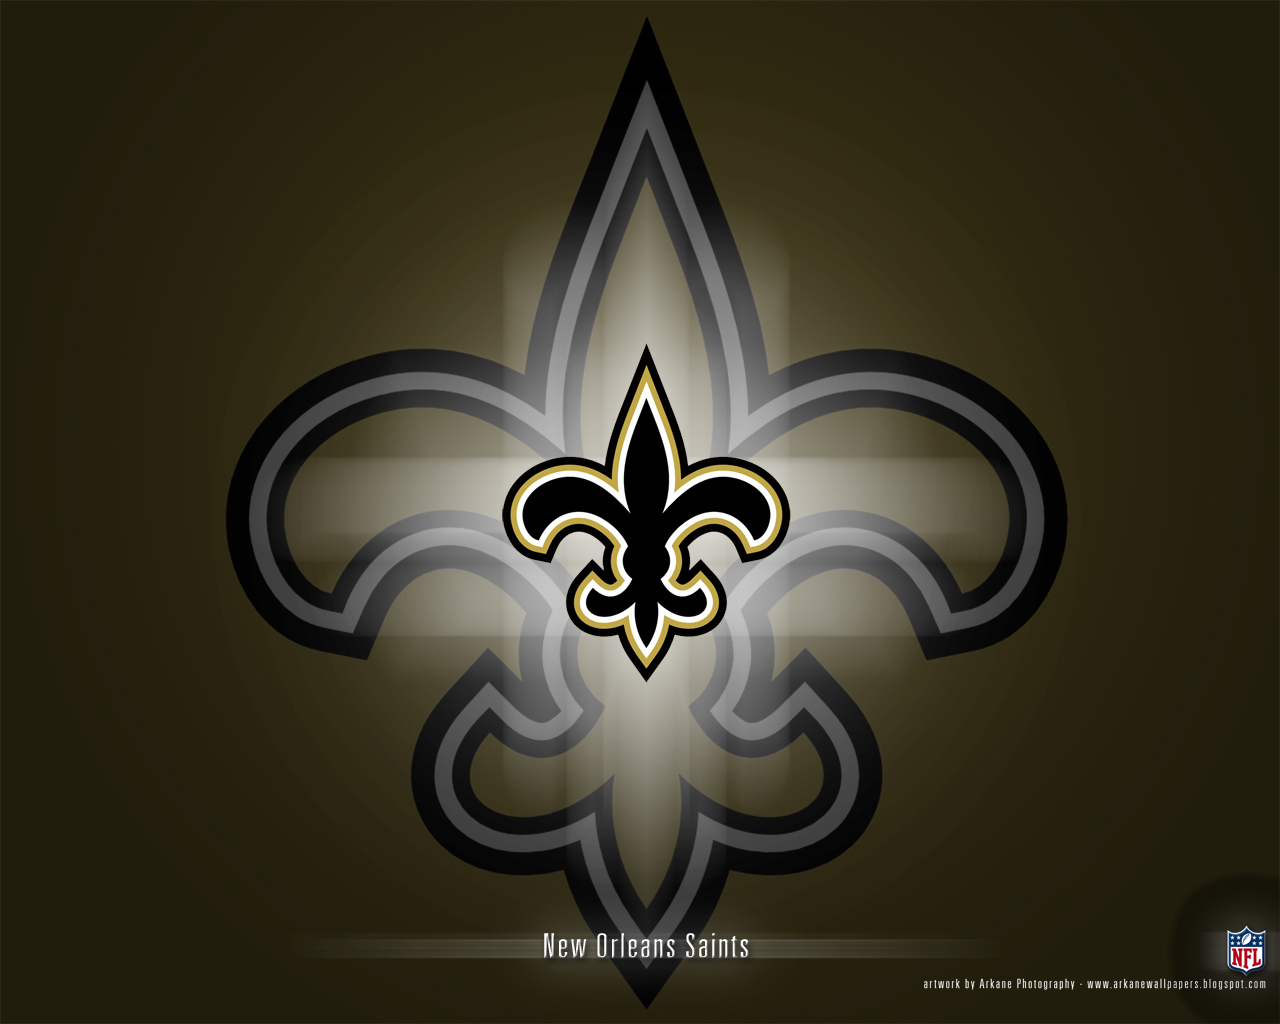 Arkane NFL Wallpapers New Orleans Saints   Vol 1 1280x1024